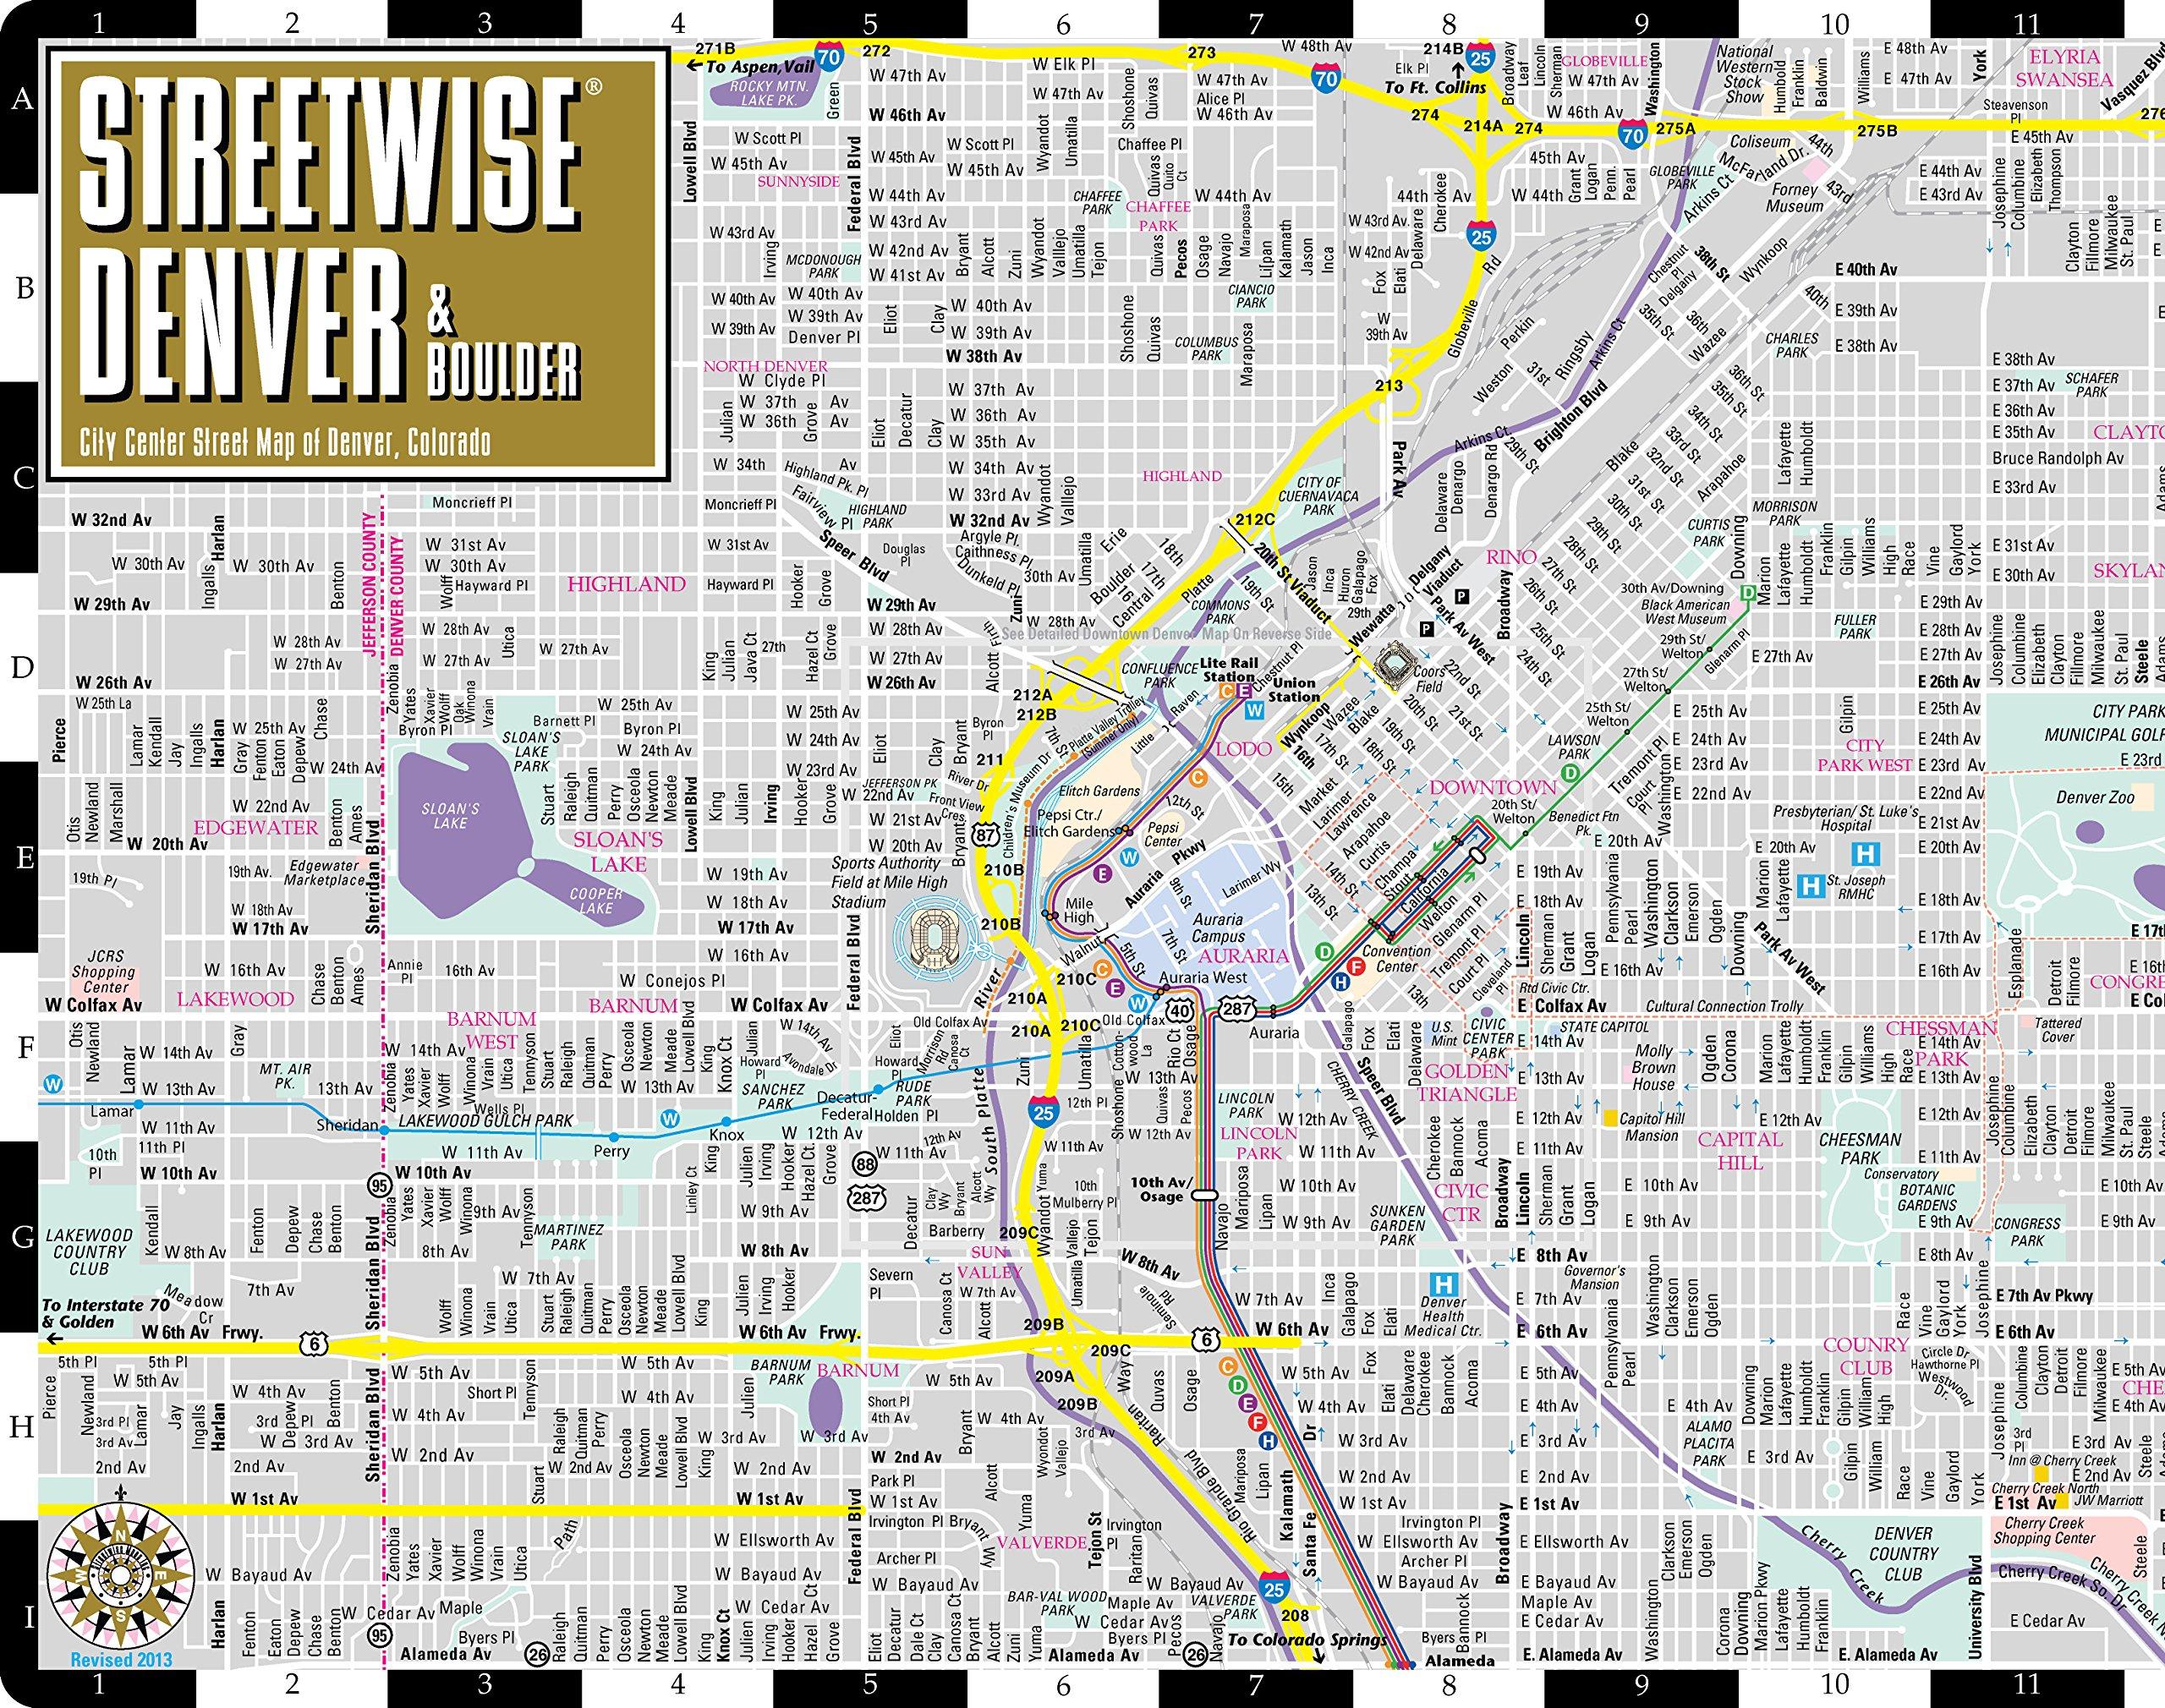 street map of denver Streetwise Denver Map Laminated City Street Map Of Denver street map of denver